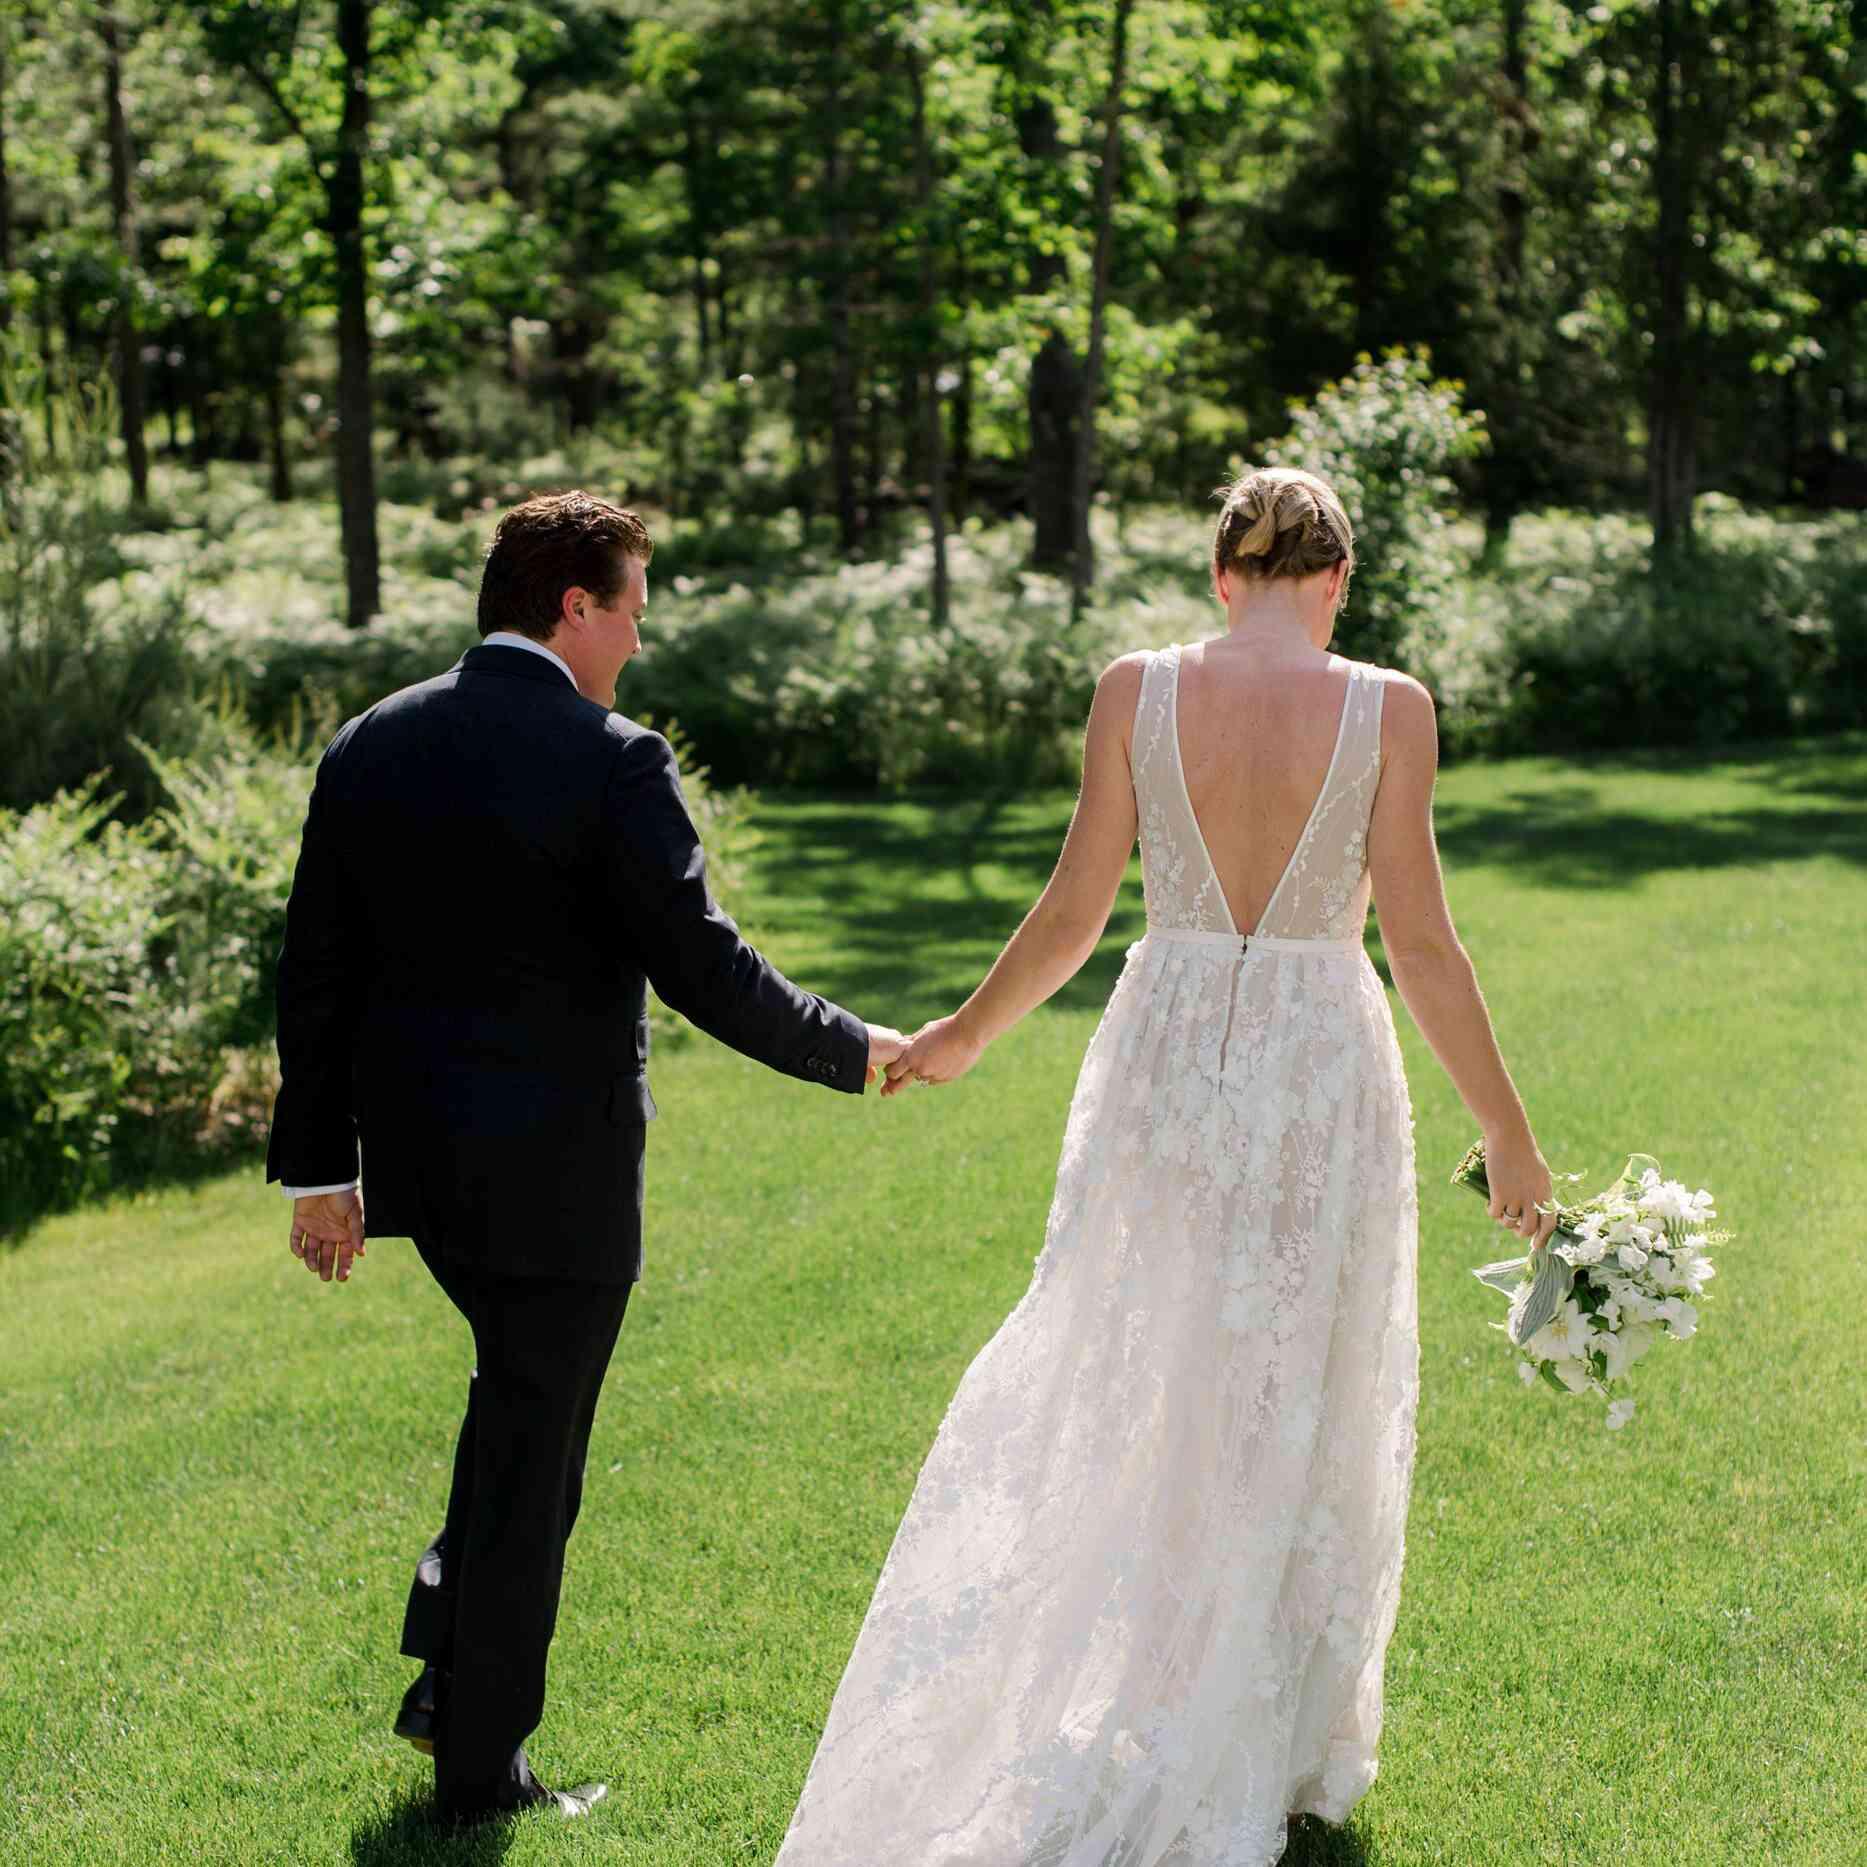 Newlyweds walking in yard